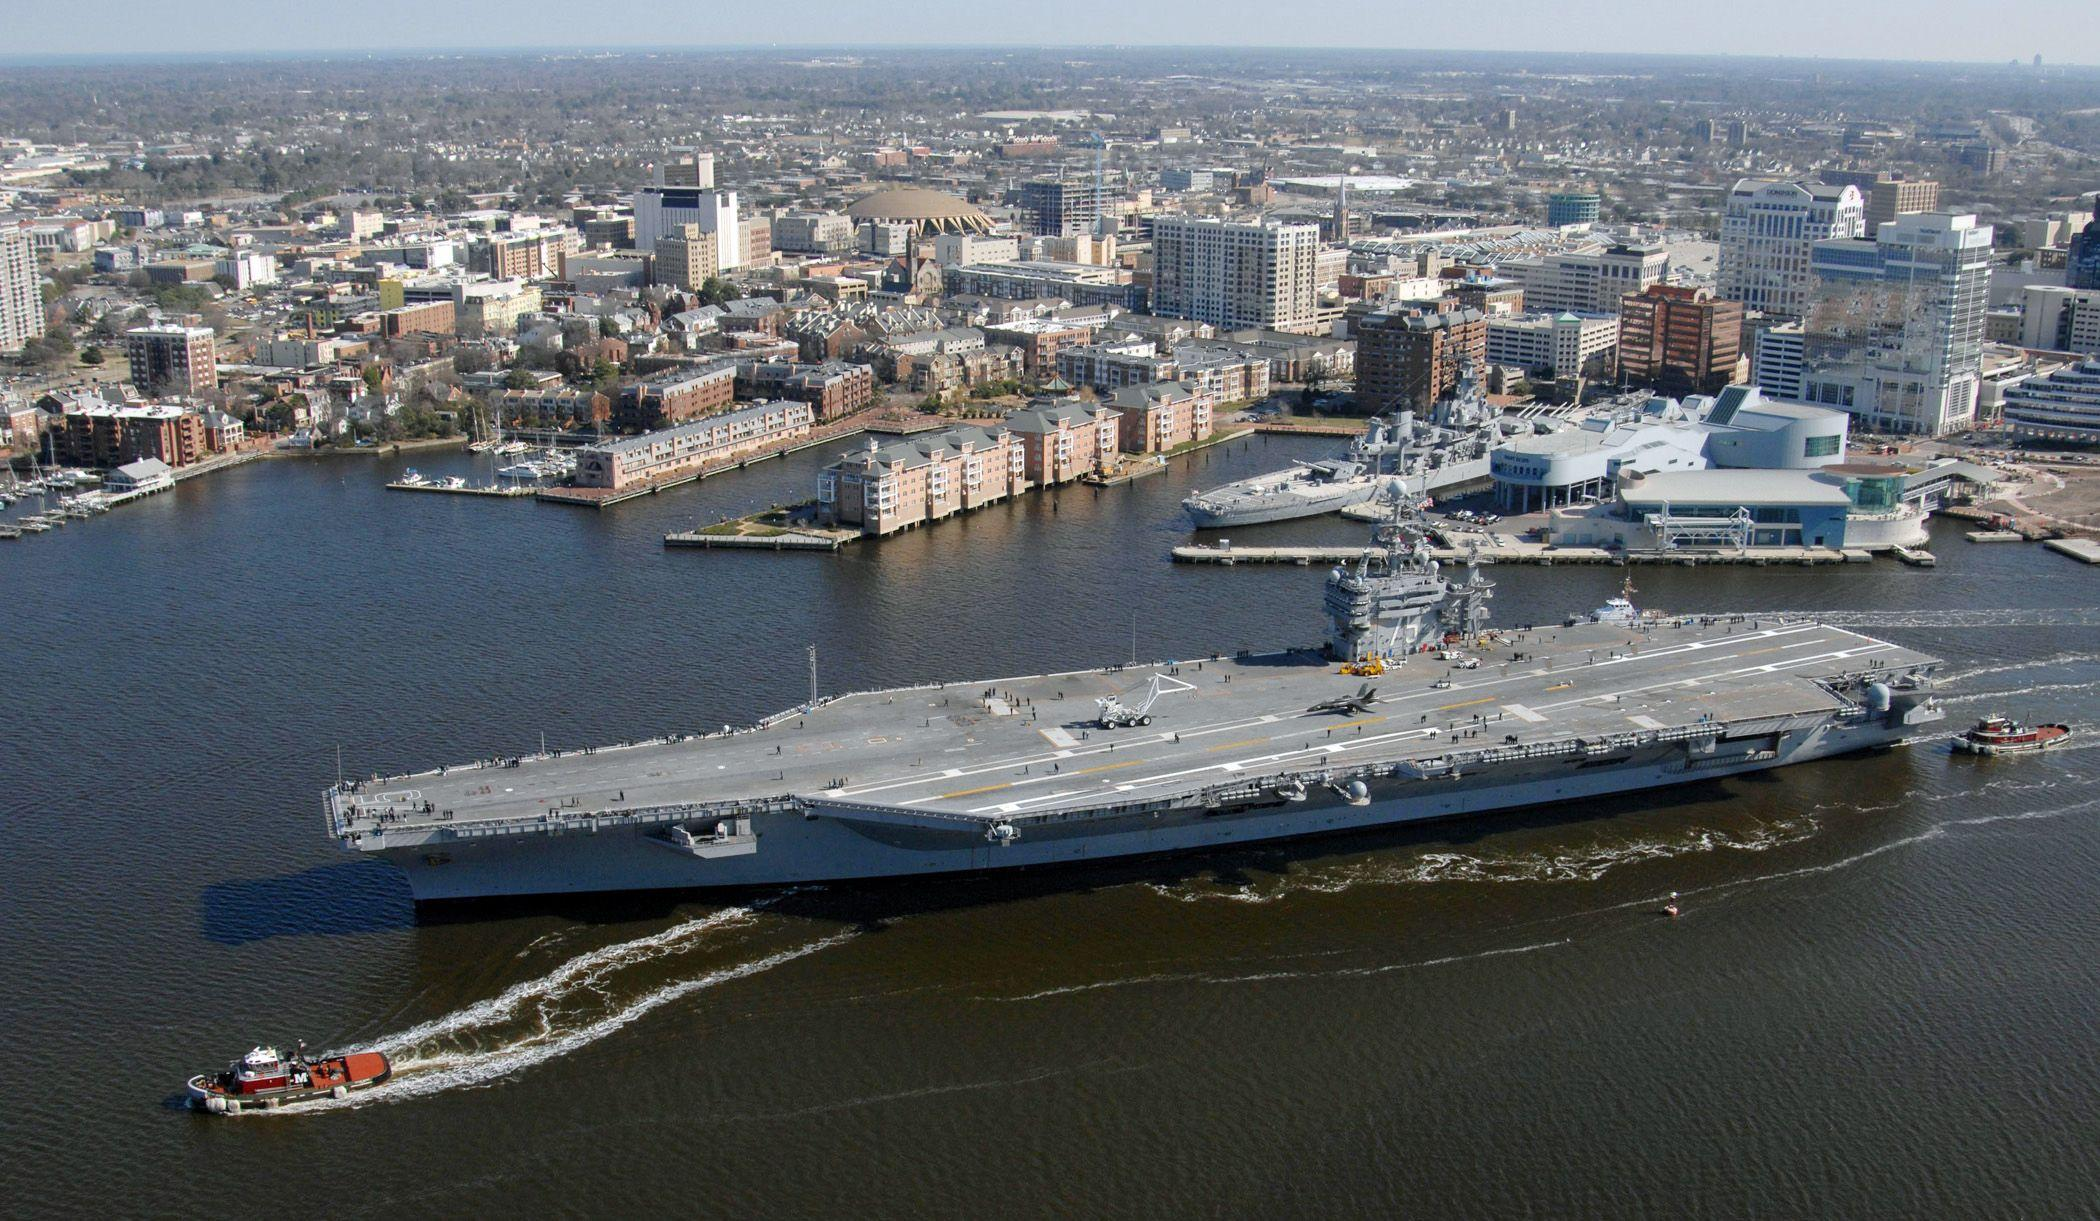 Uss Nimitz Size Comparison USS Nimitz Wall...